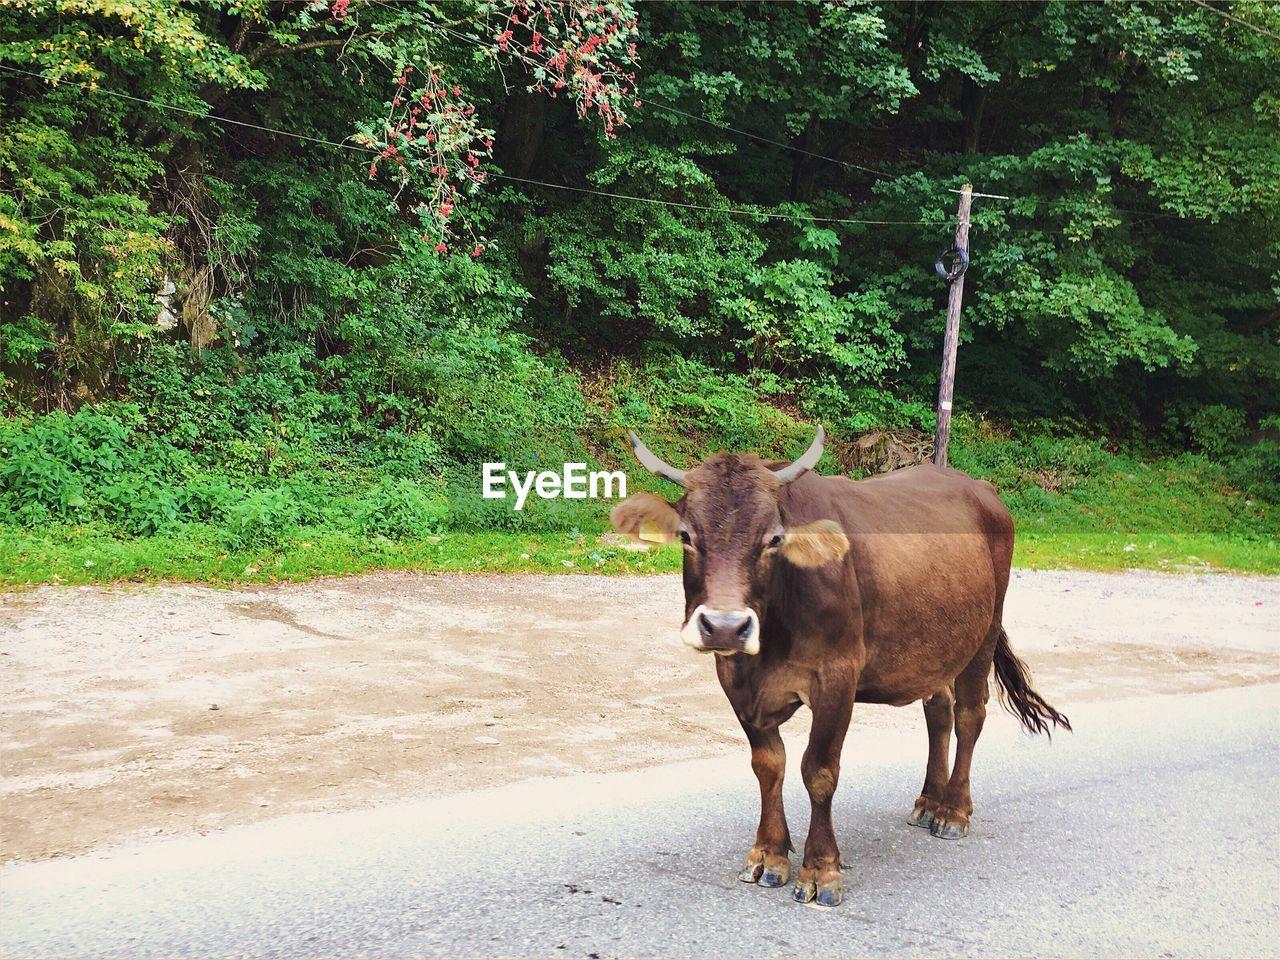 Full length of bull standing on footpath against tree